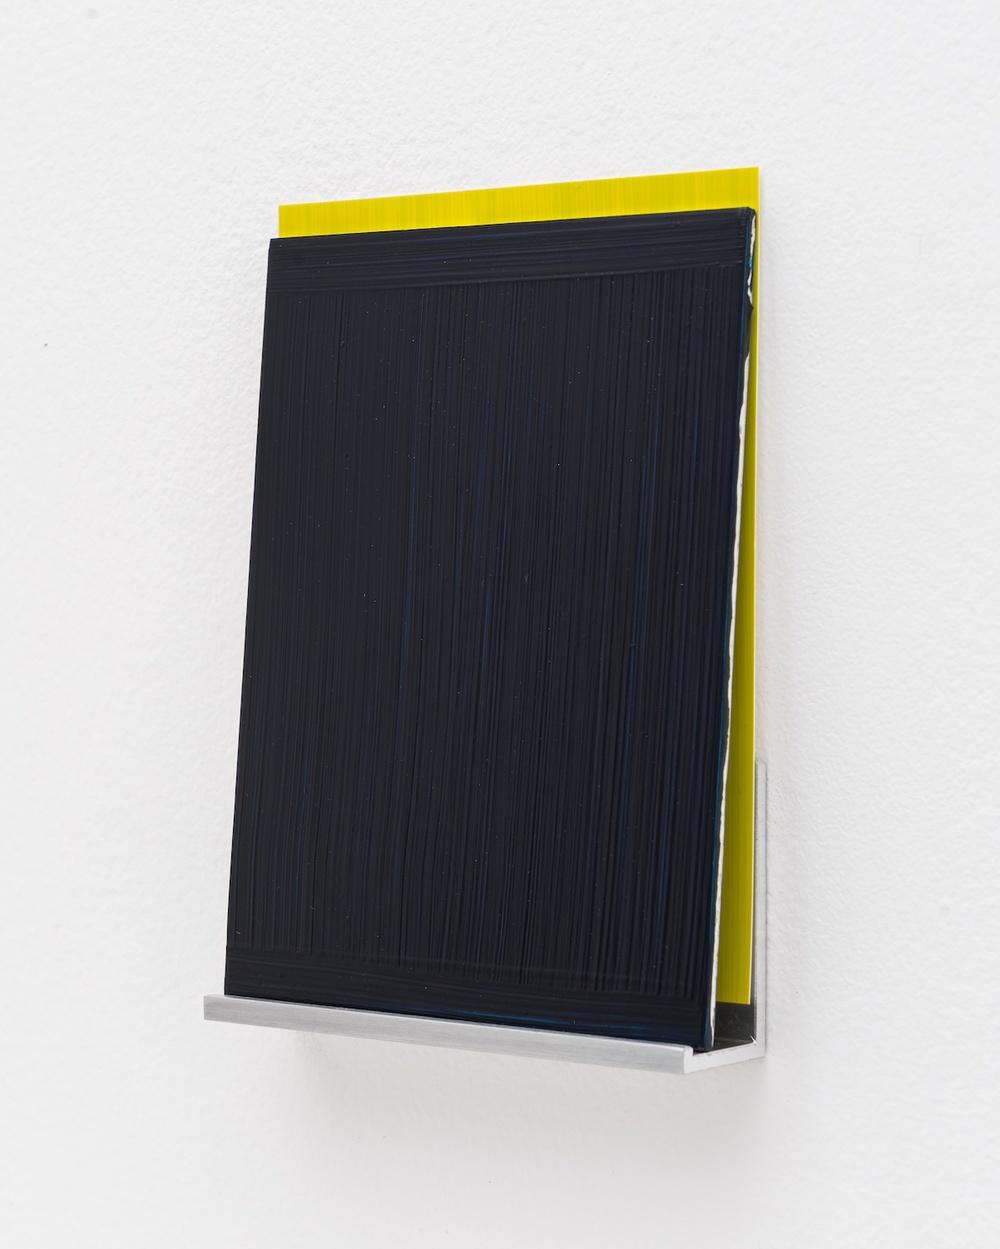 Imi Knoebel  An Meine Grüne Seite A 13-4  2013 Acrylic on aluminum, acrylic on plastic film, aluminum shelf 5 ½h x 4 ⅛w x 1d in IK004